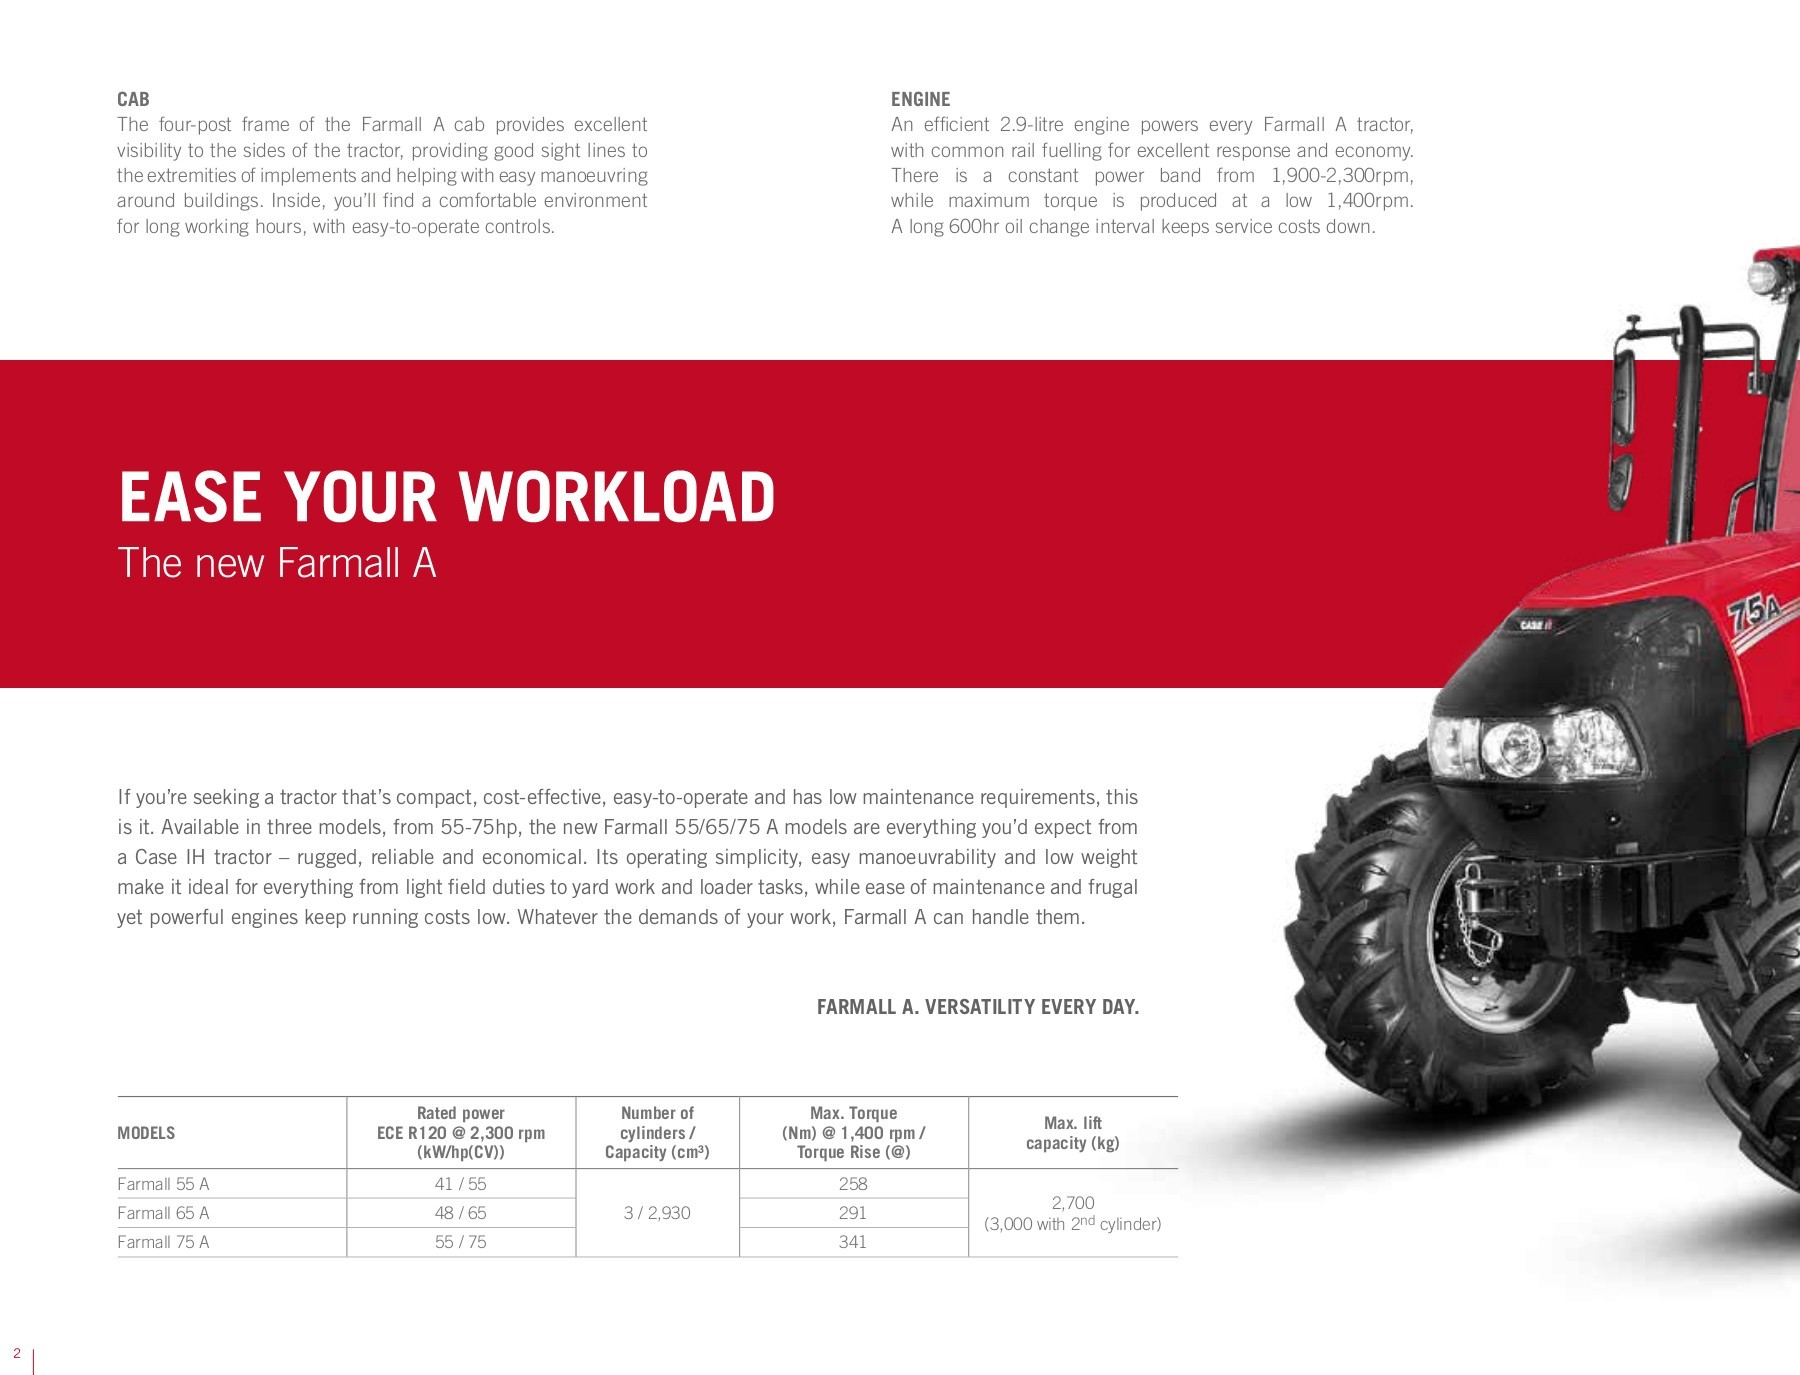 Farmall 55-75 A | Tractors | Products | Case IH